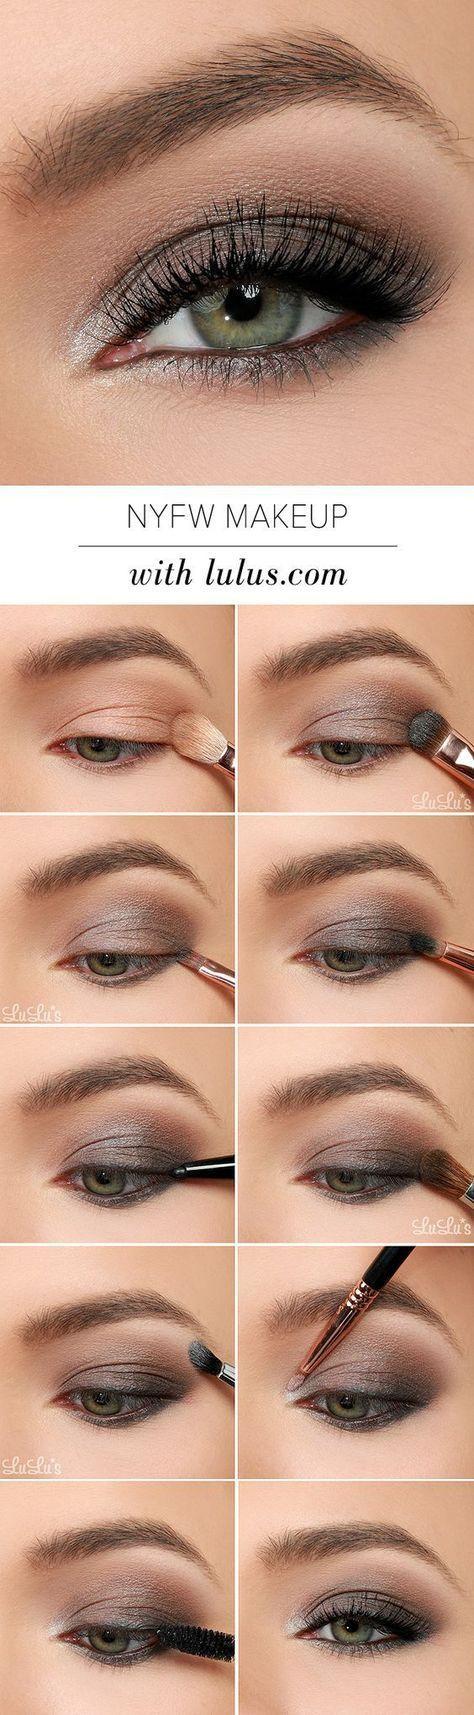 Lulus How-To: 2015 NYFW Inspired Eye Shadow Tutorial - Lulus.com Fashion Blog -  TheNorwegianPrincess♚  - #amazingEyeMakeup #Blog #brightEyeMakeup #darkEyeMakeup #eye #EyeMakeupmorenas #EyeMakeuppasoapaso #Fashion #glamEyeMakeup #HowTo #Inspired #Lulus #Luluscom #neutralEyeMakeup #NYFW #shadow #tutorial #yellowEyeMakeup